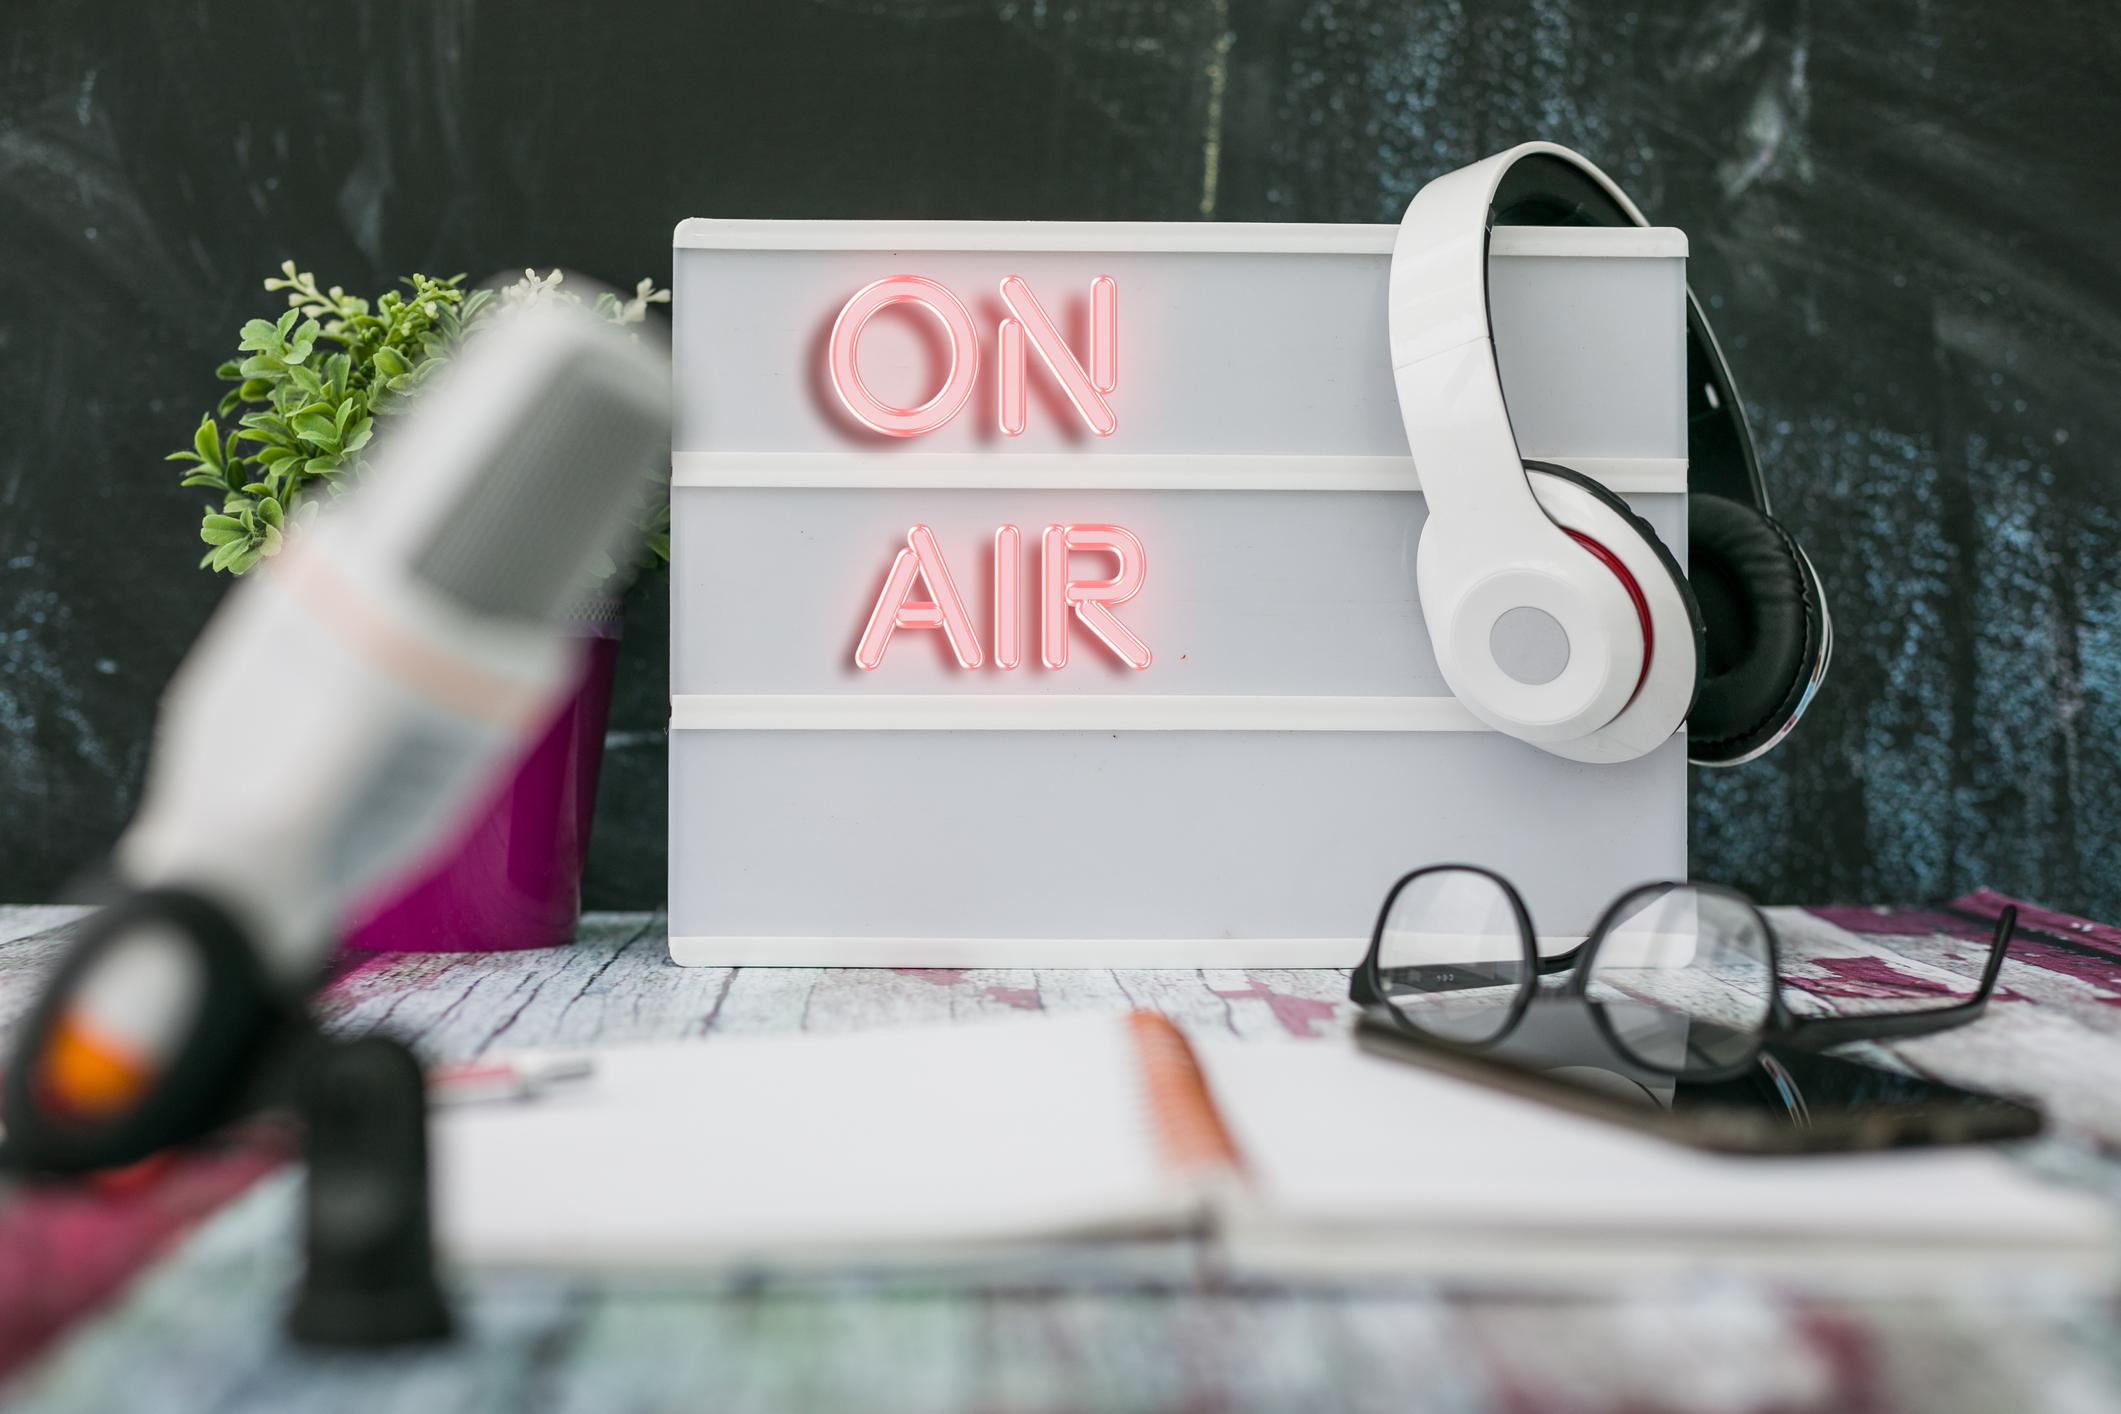 amor en radio